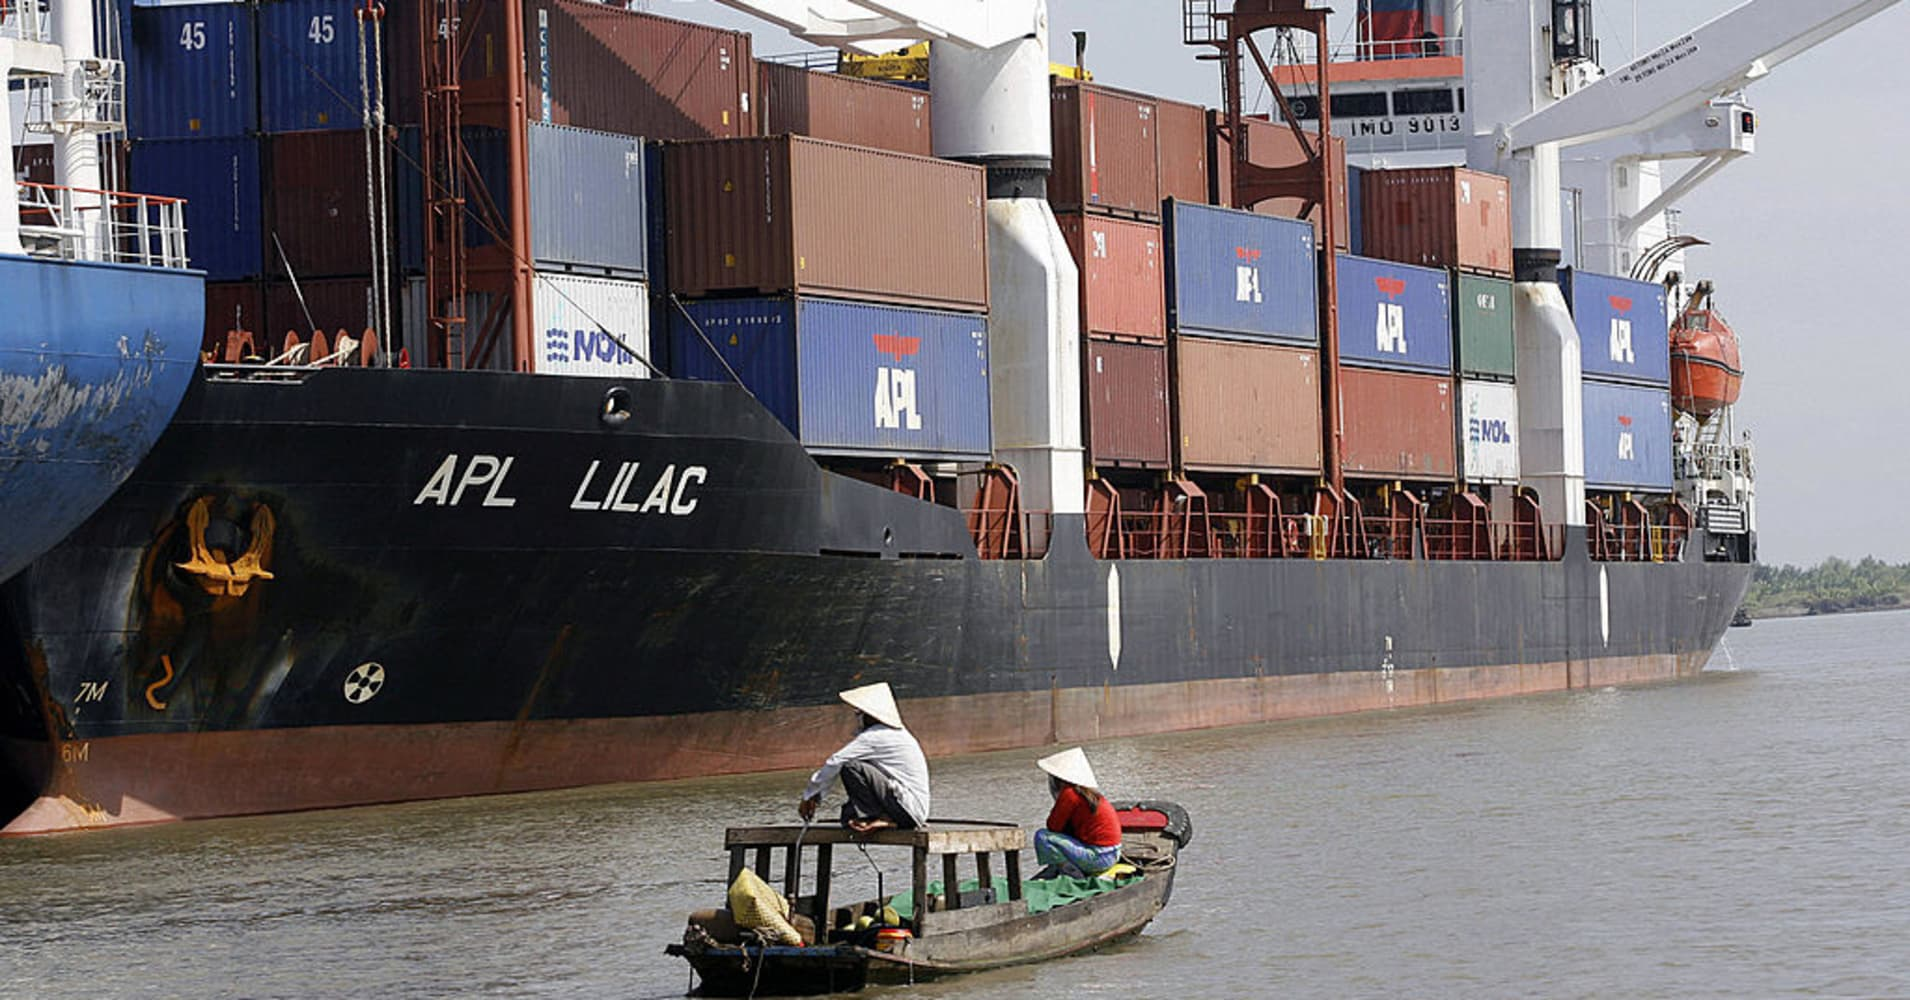 Reporter's notebook: An app to crack the export market